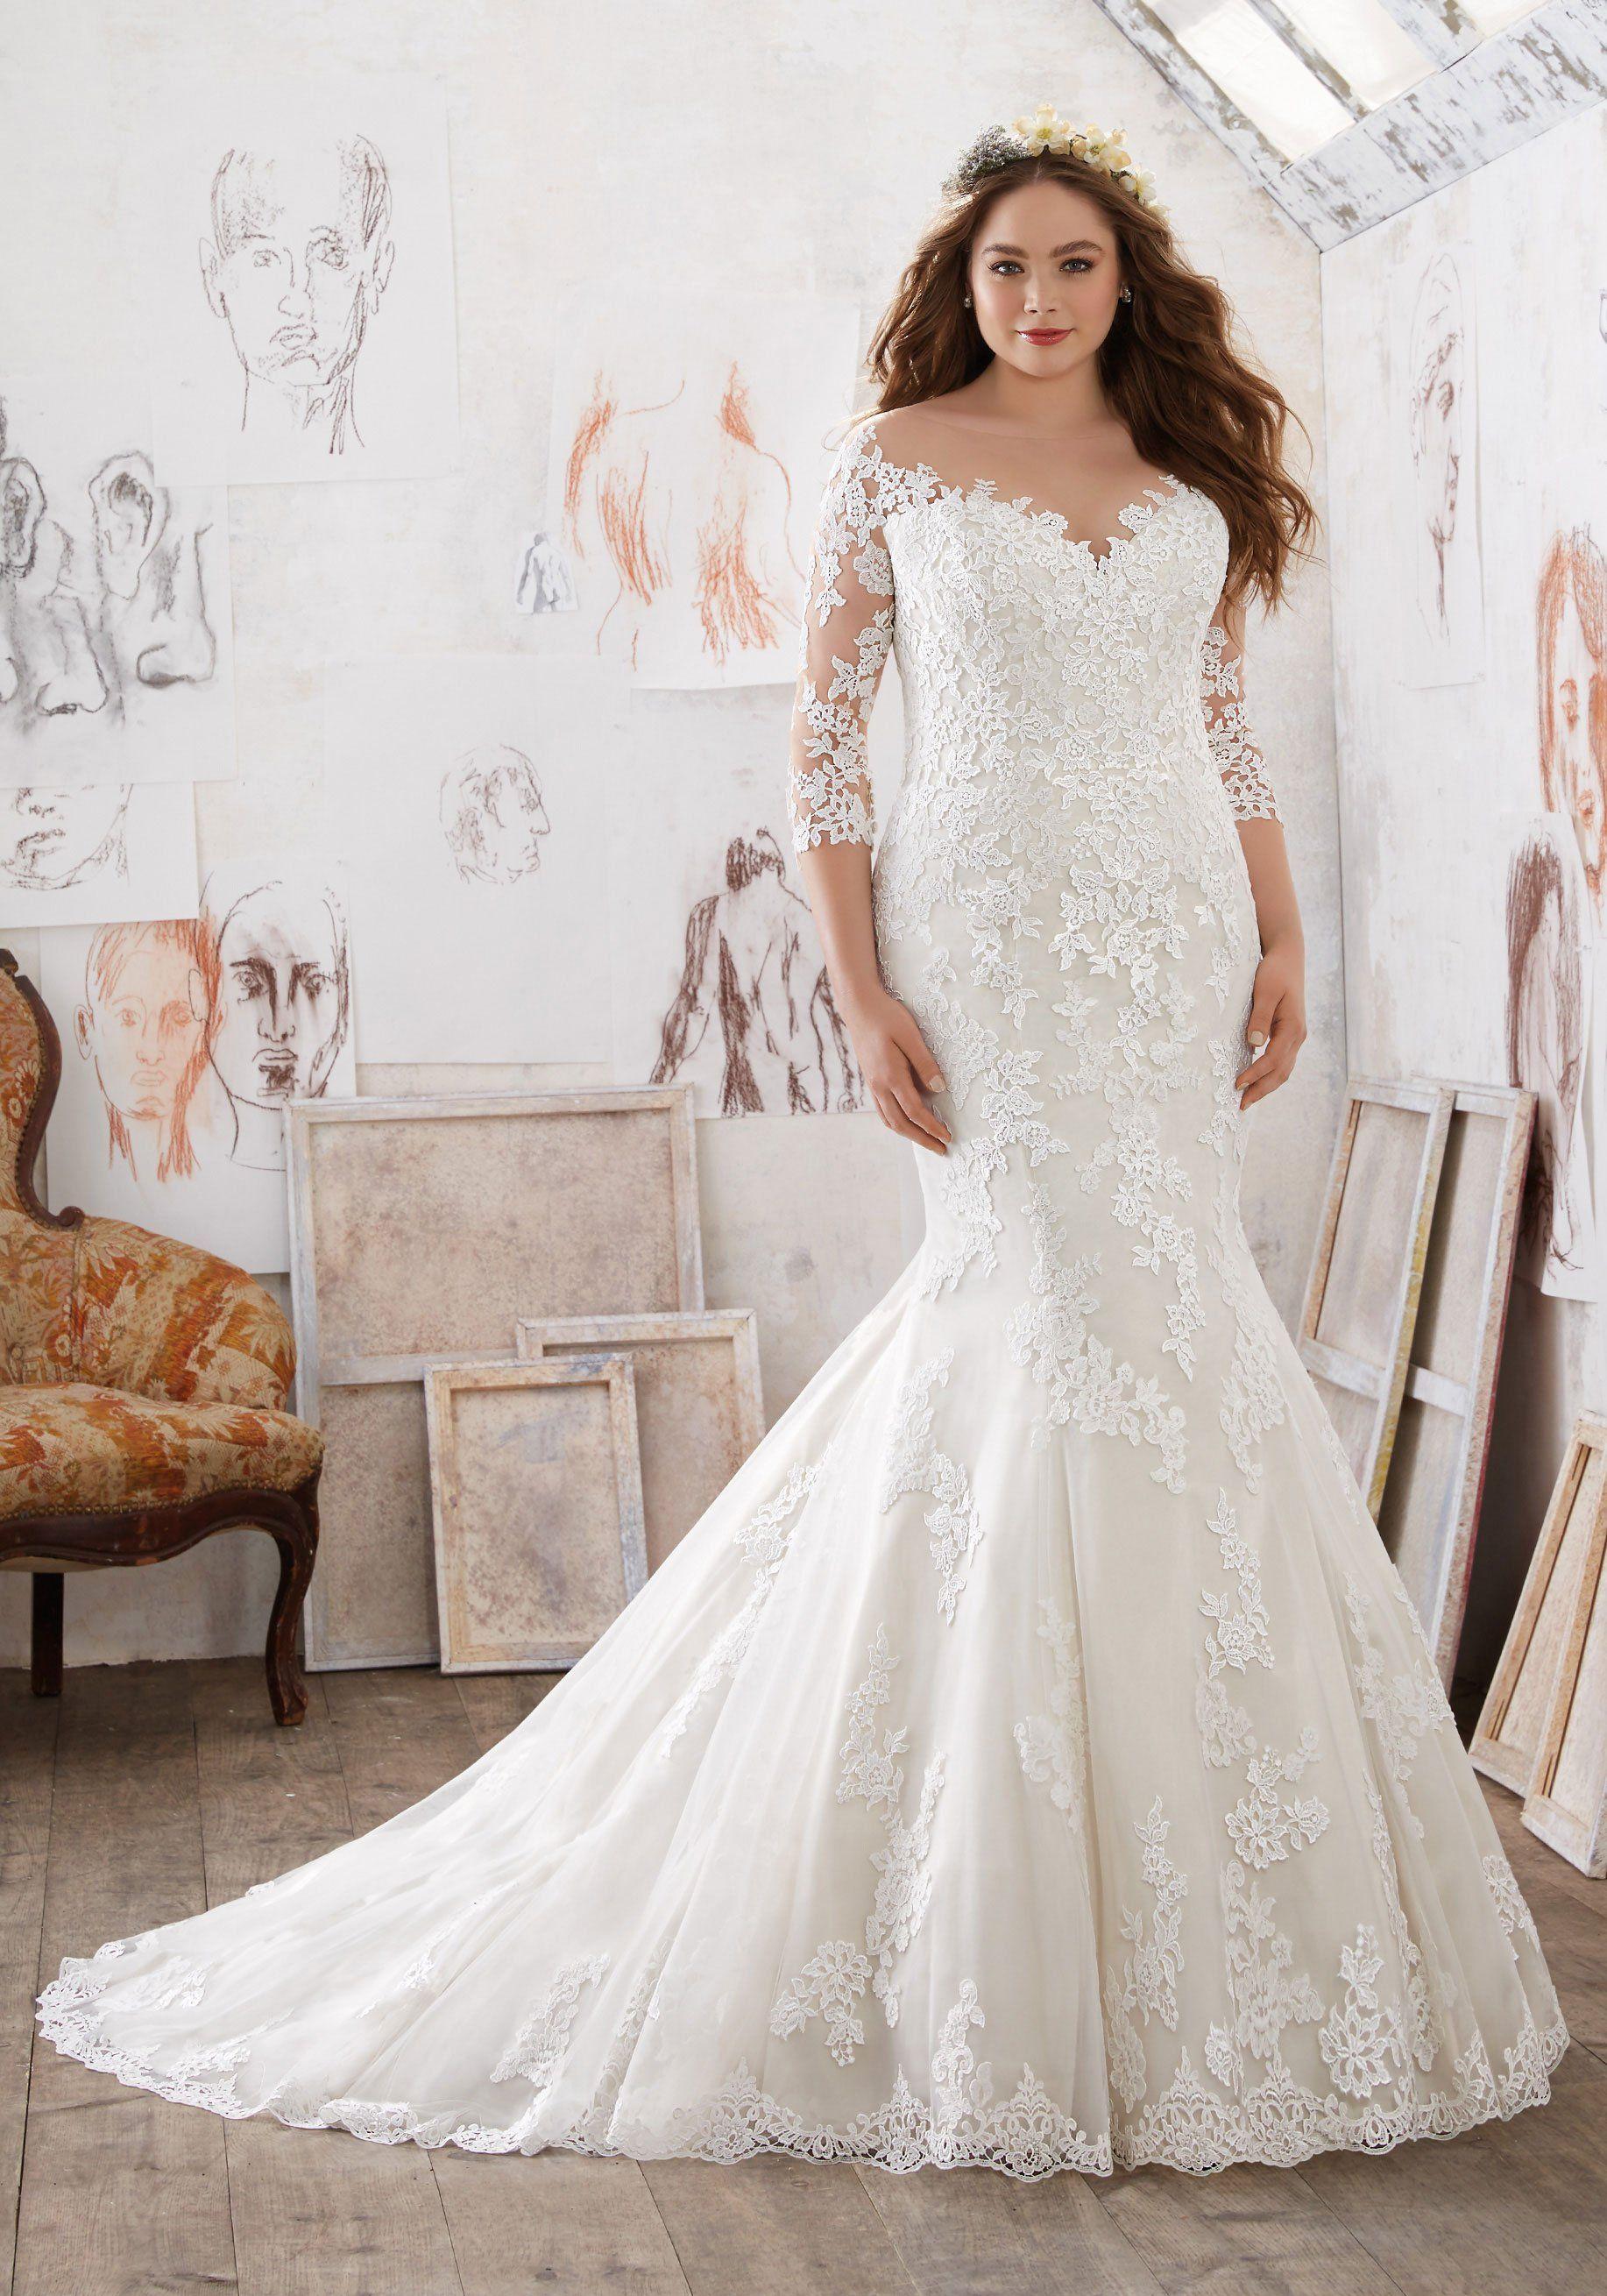 481372b2c79a GINNA 2019 brudekjole - Panayotis